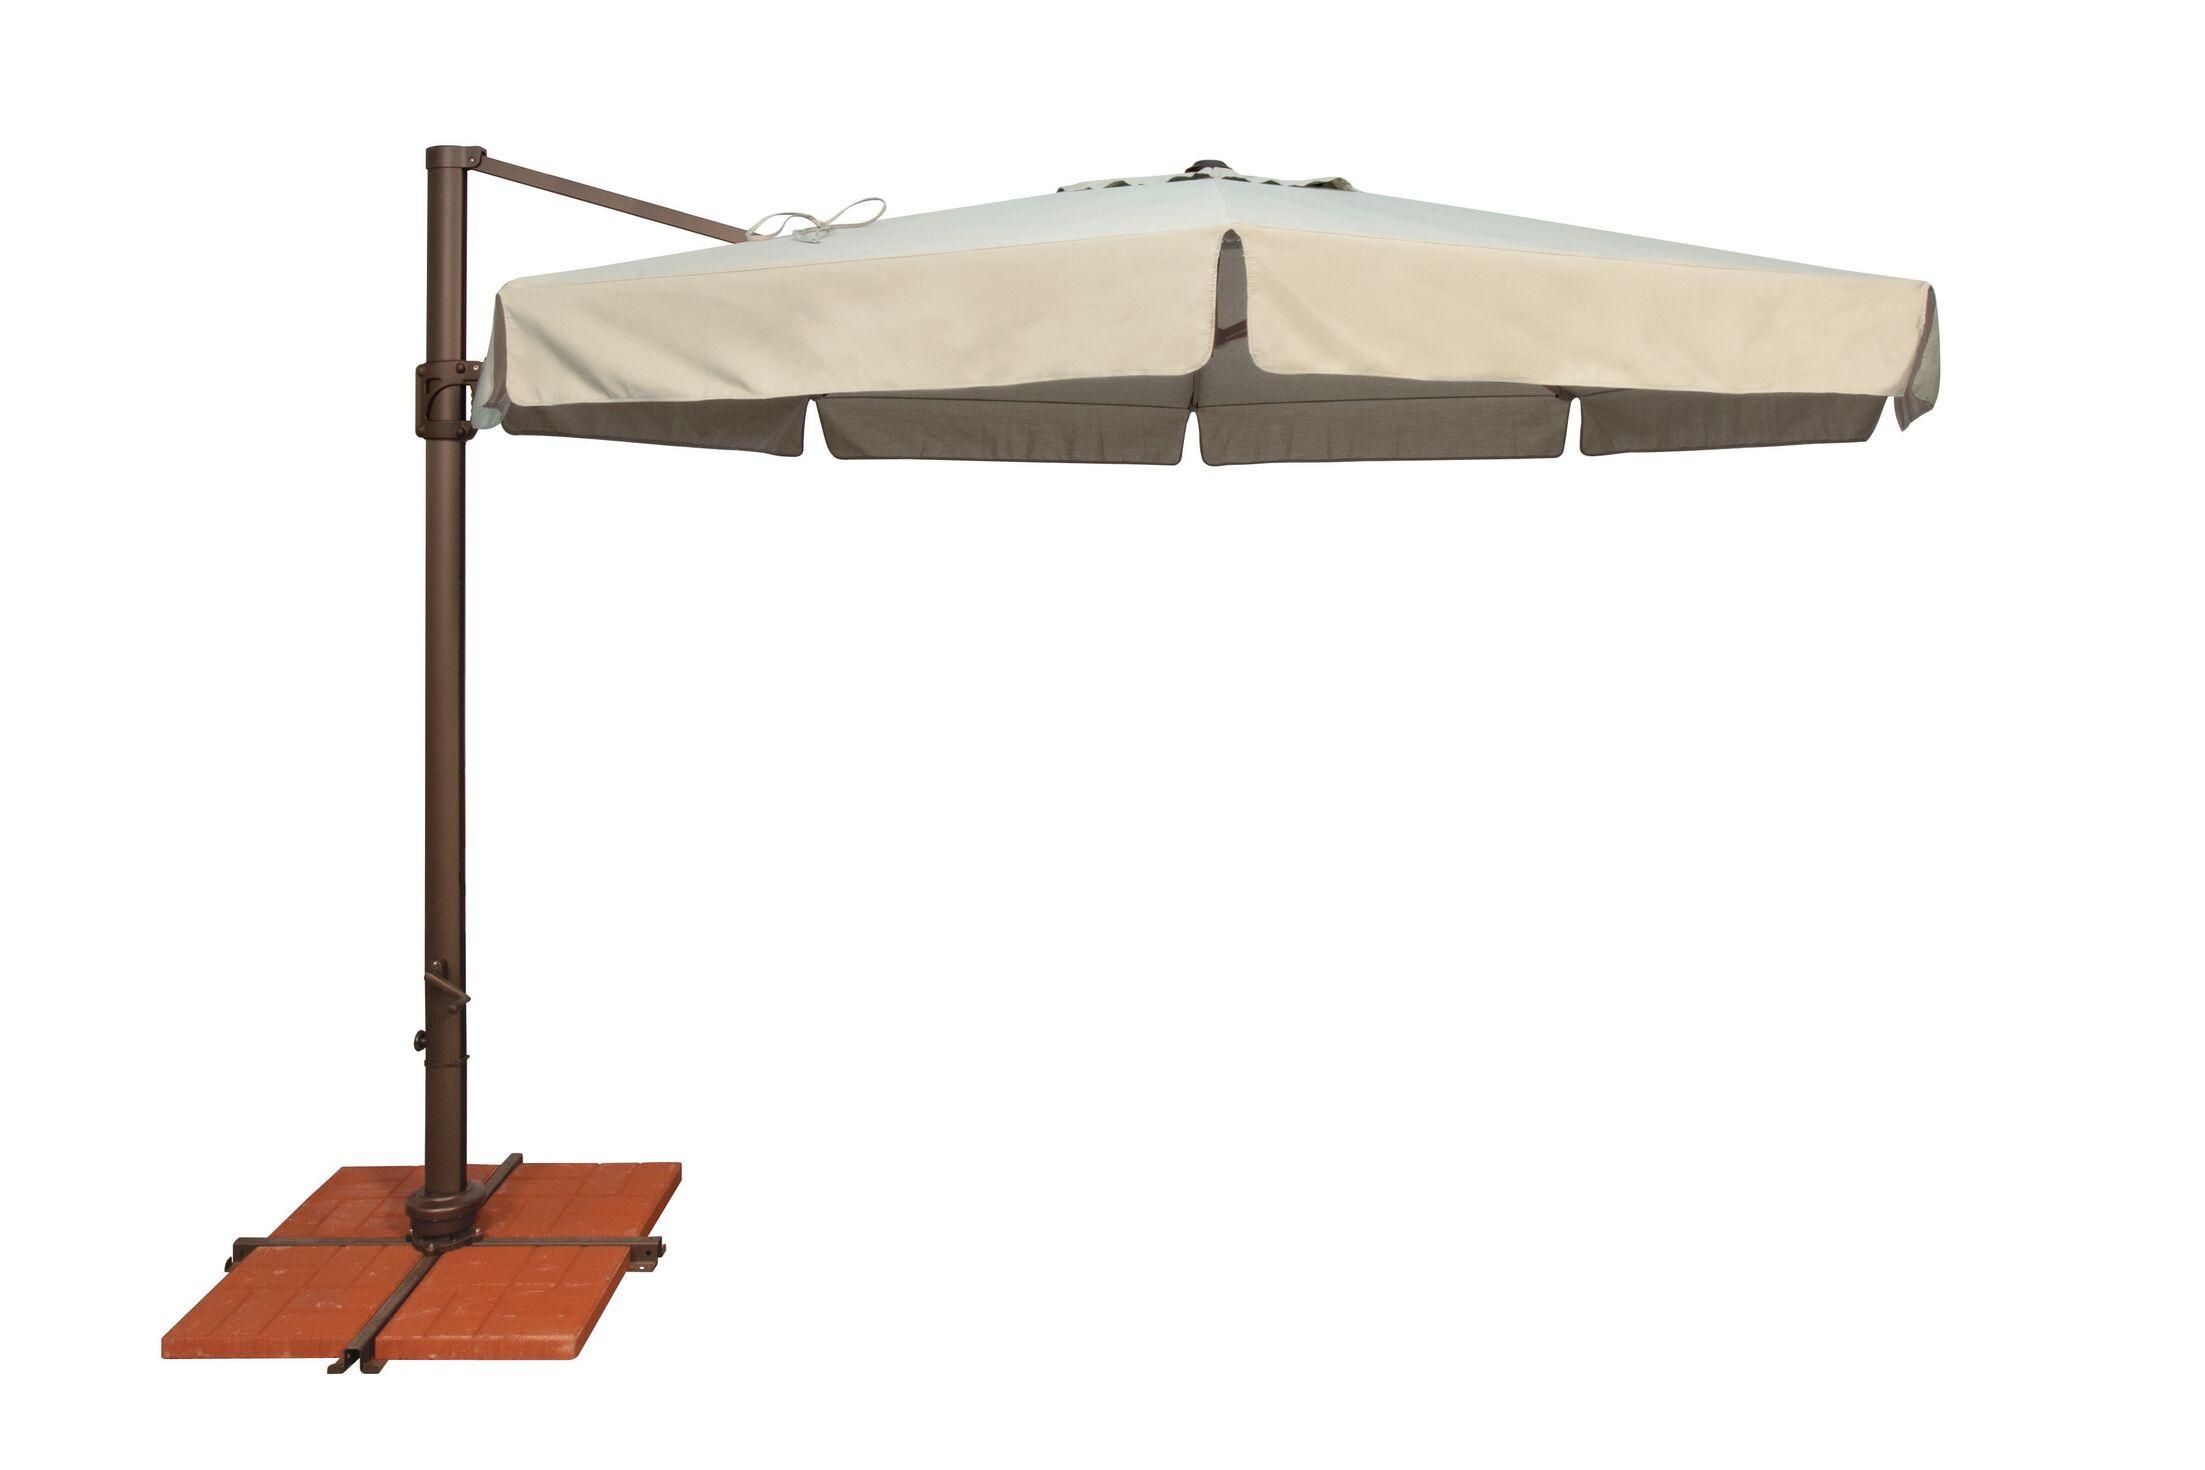 Bali 11' Cantilever Umbrella Fabric: Solefin / Beige